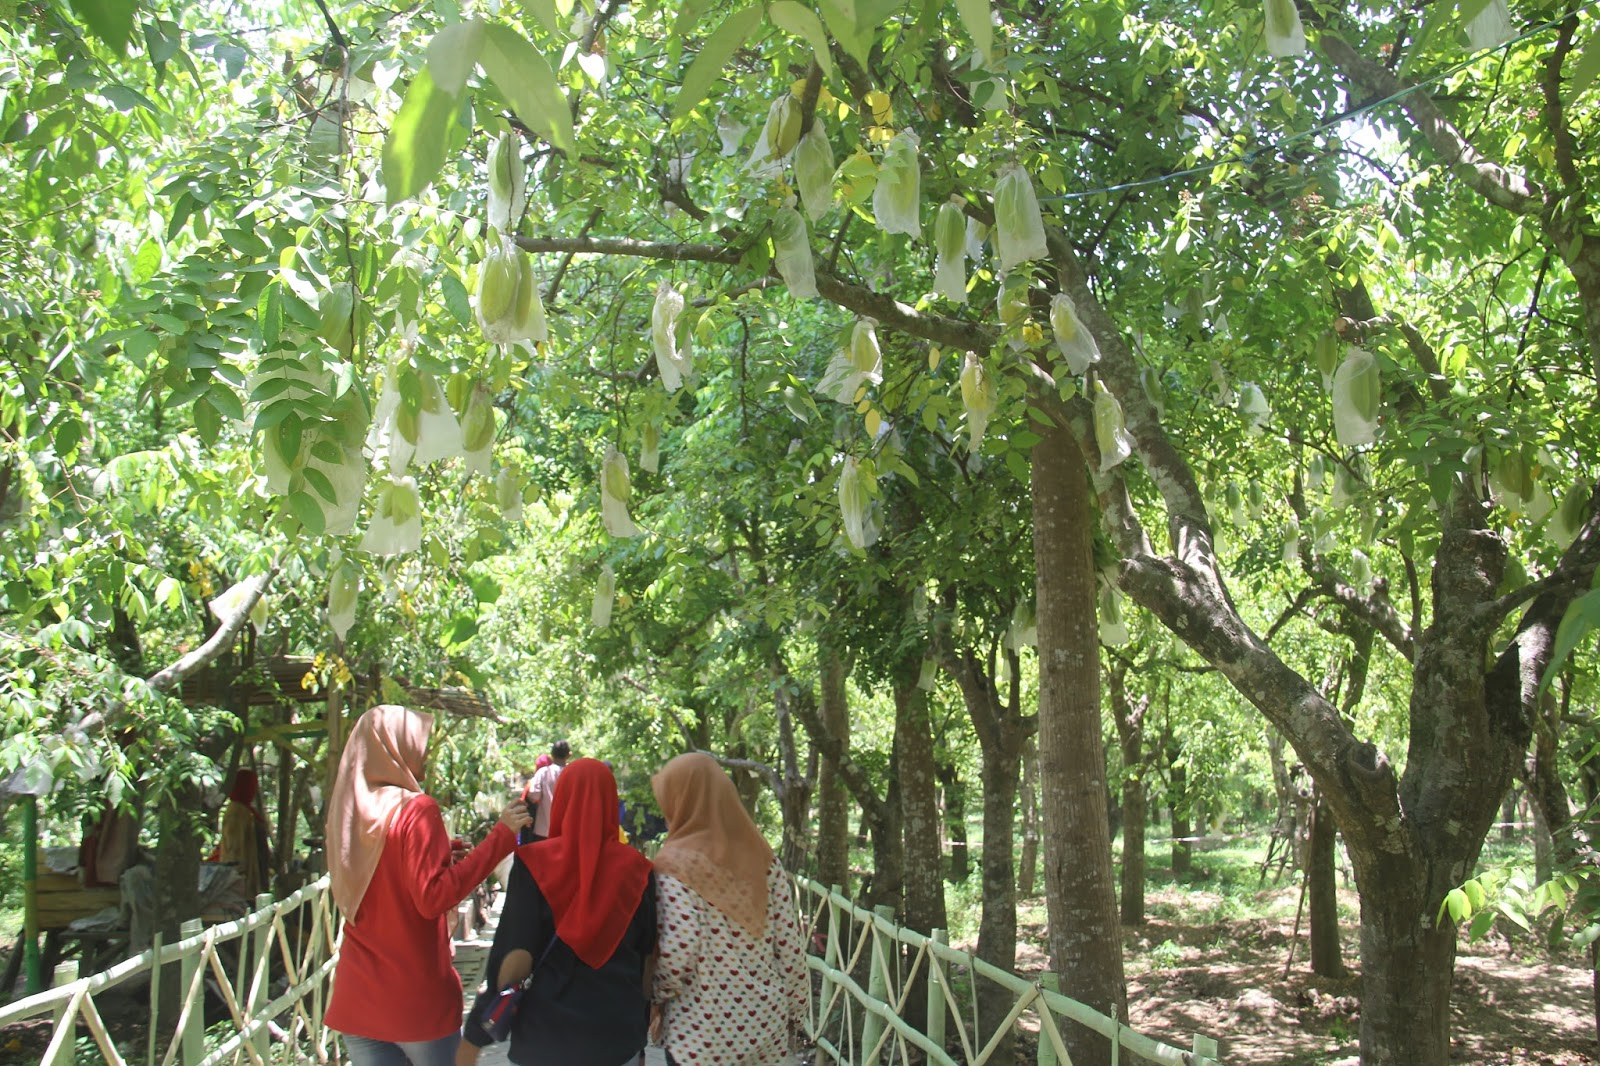 Agrowisata Belimbling Kerajinan Gerabah Bojonegoro Suguhkan Kebun Belimbing Ngringinrejo Kalitidu